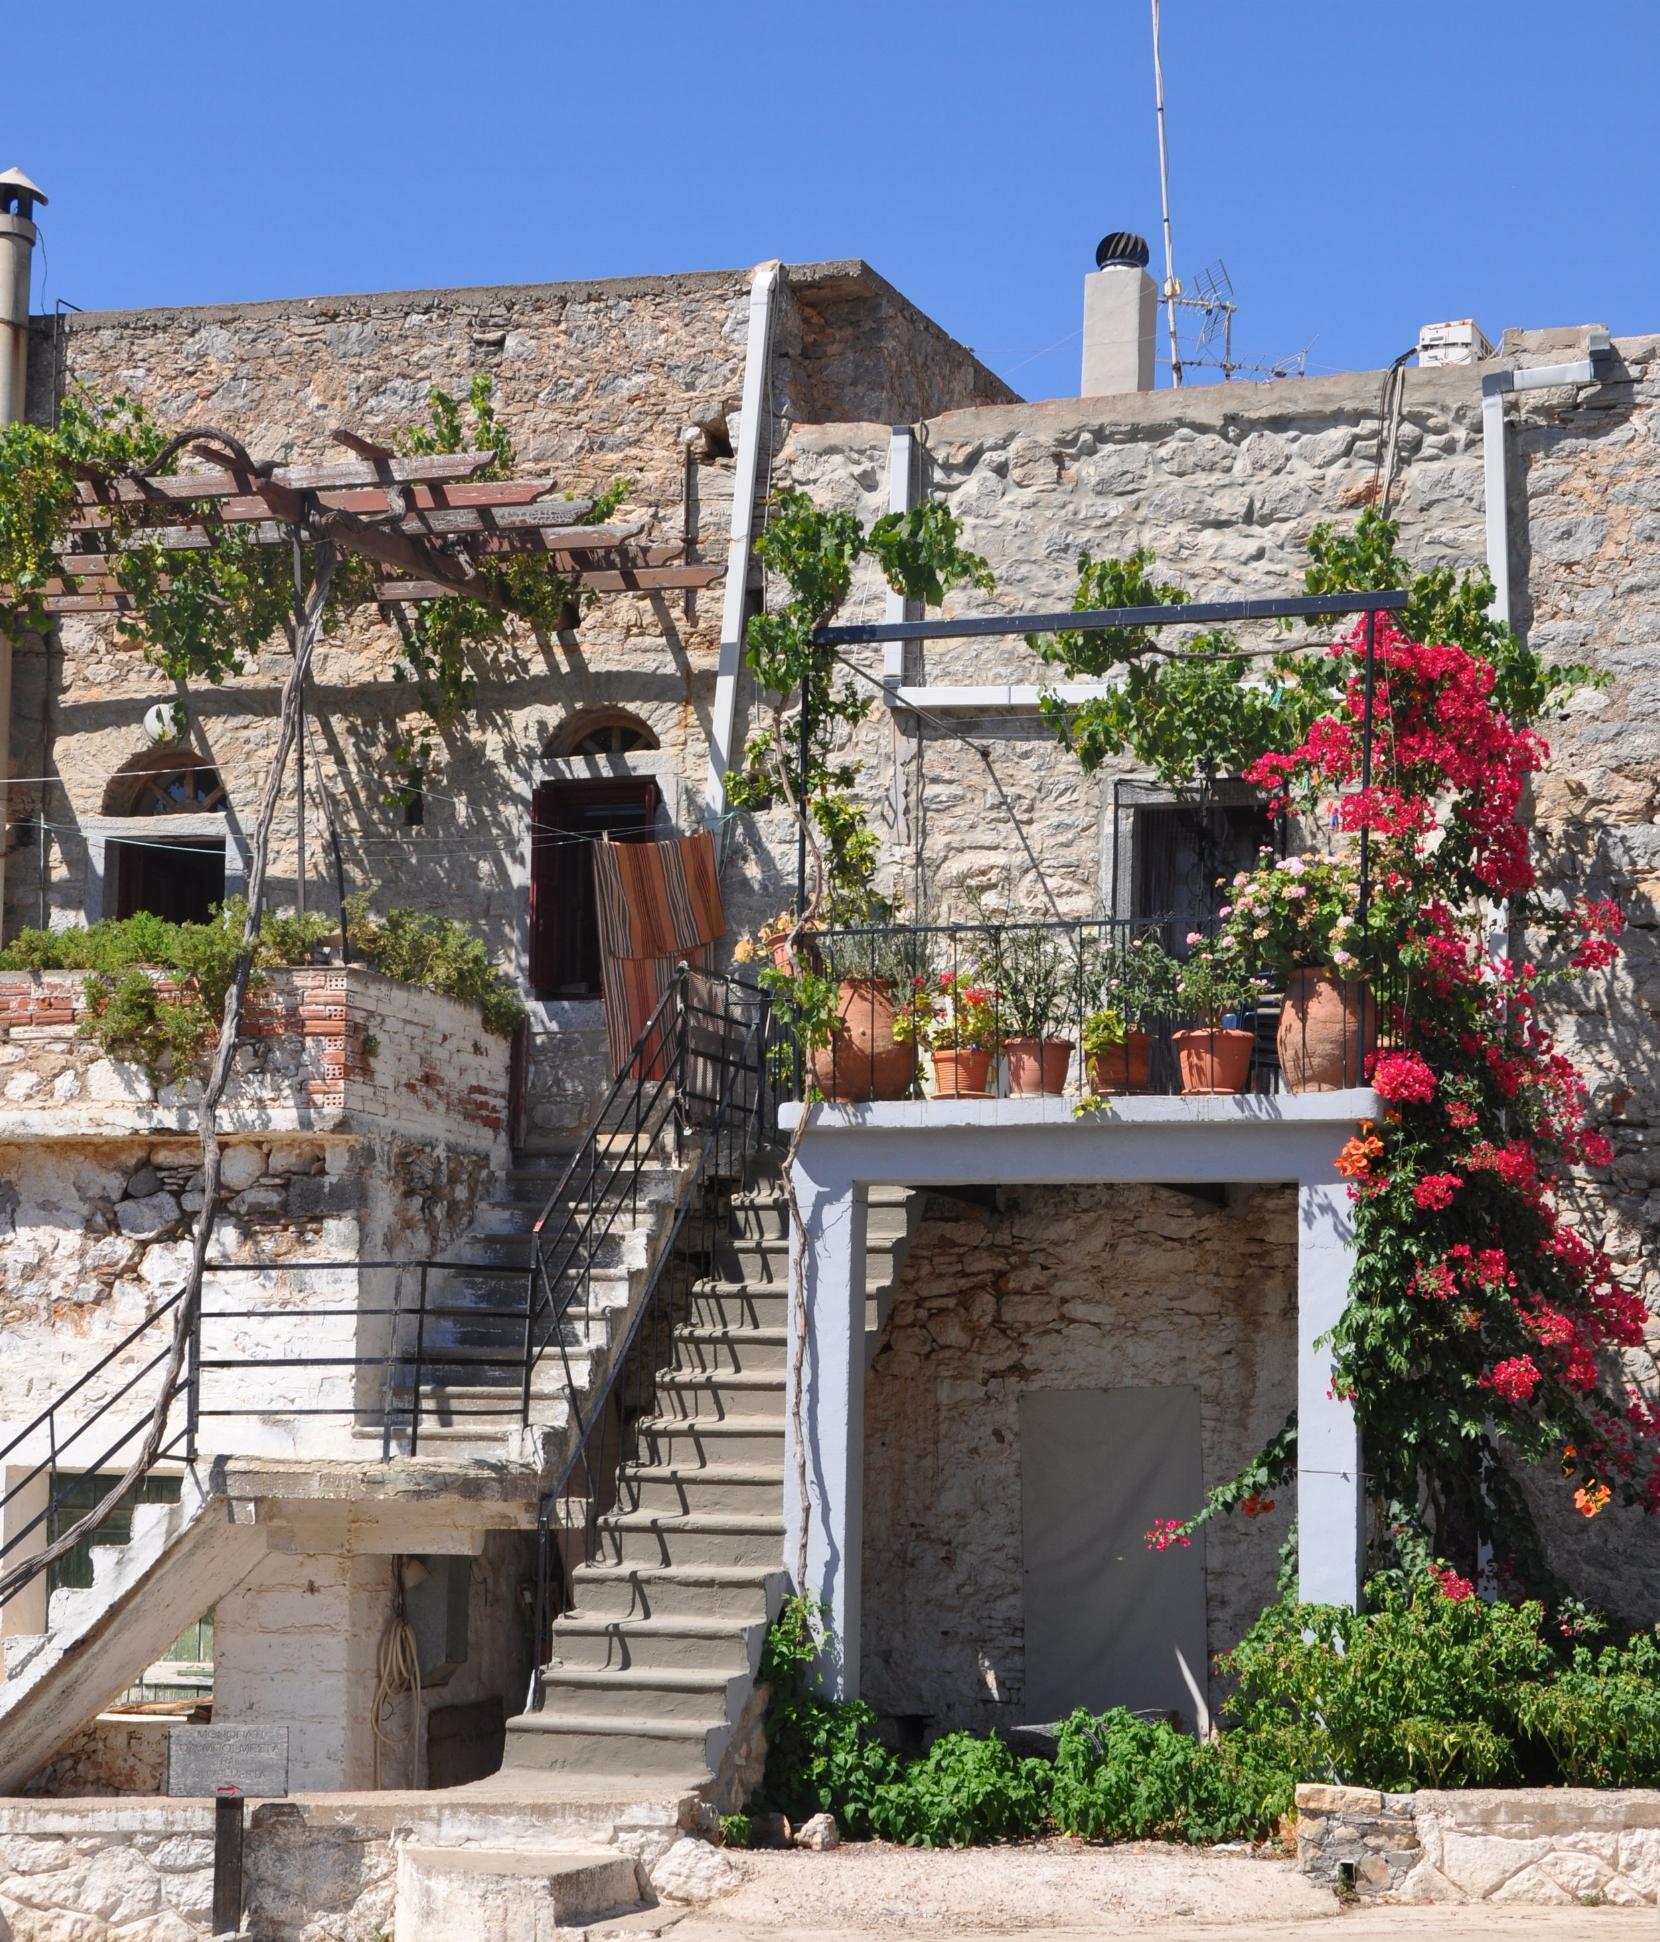 Entering the medieval vilage of Mesta, Chios, Greece